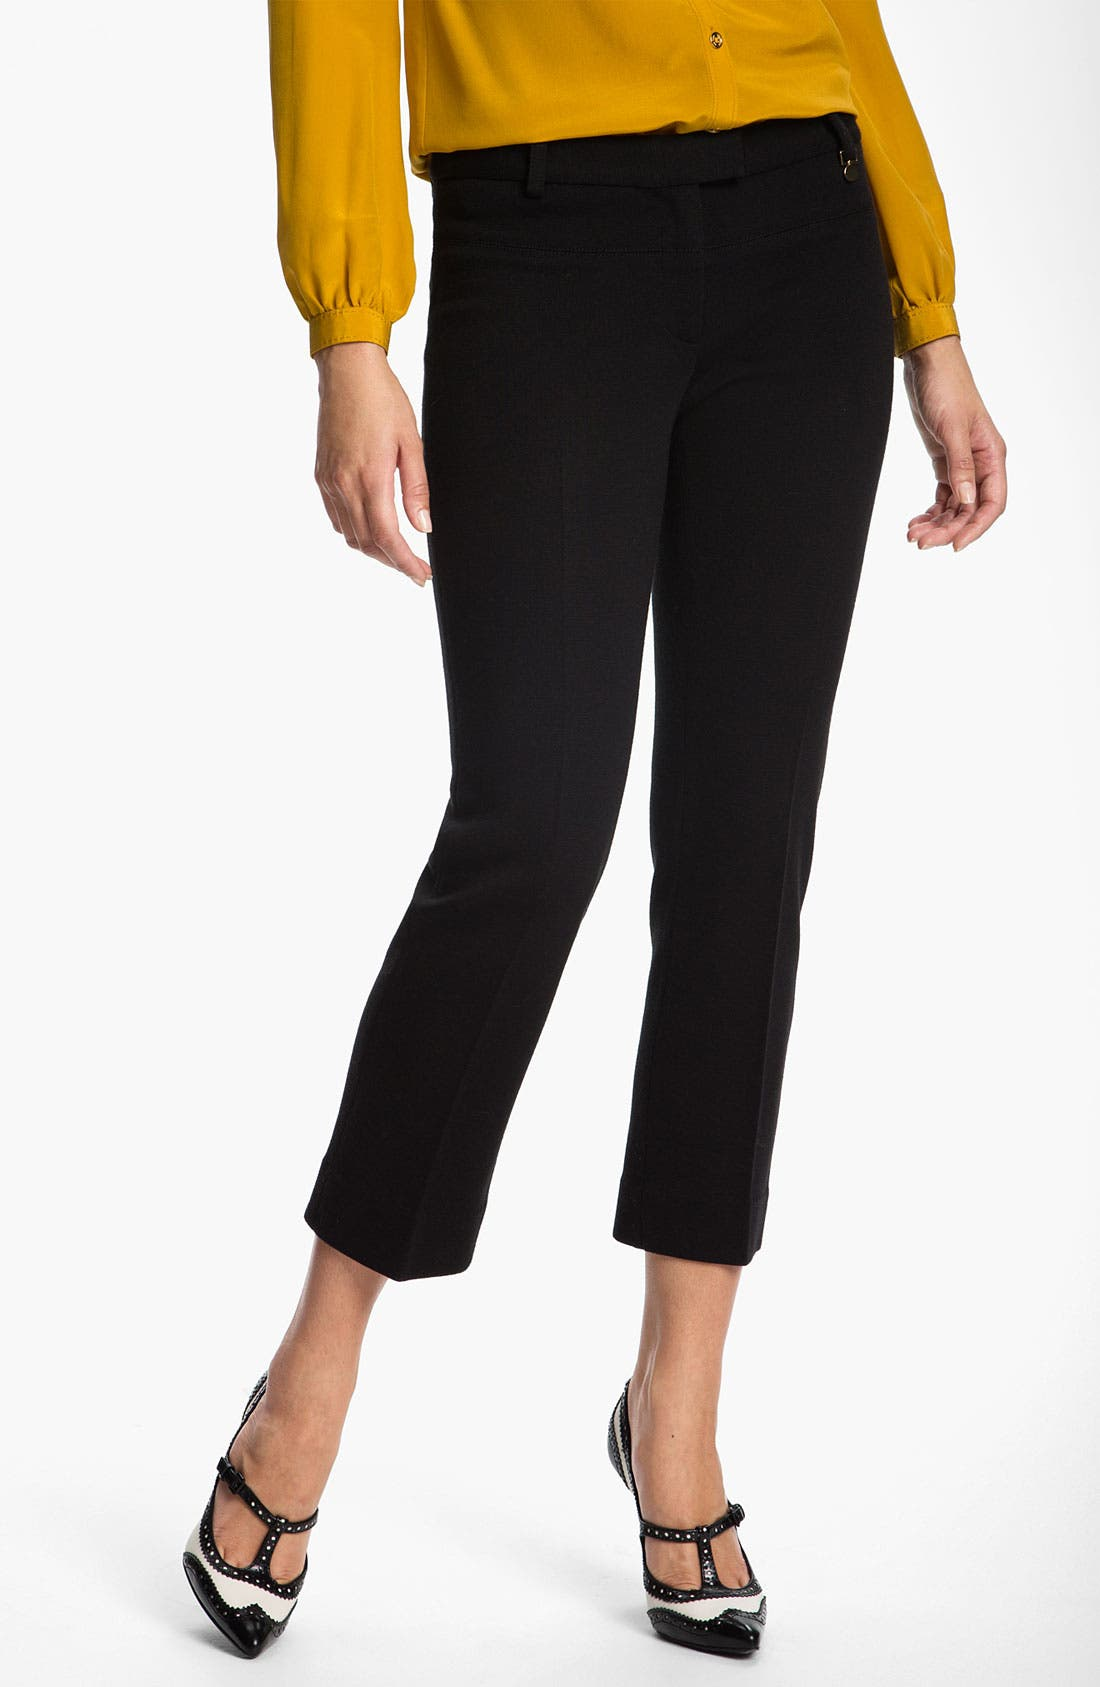 Main Image - Tory Burch 'Beverly' Crop Pants